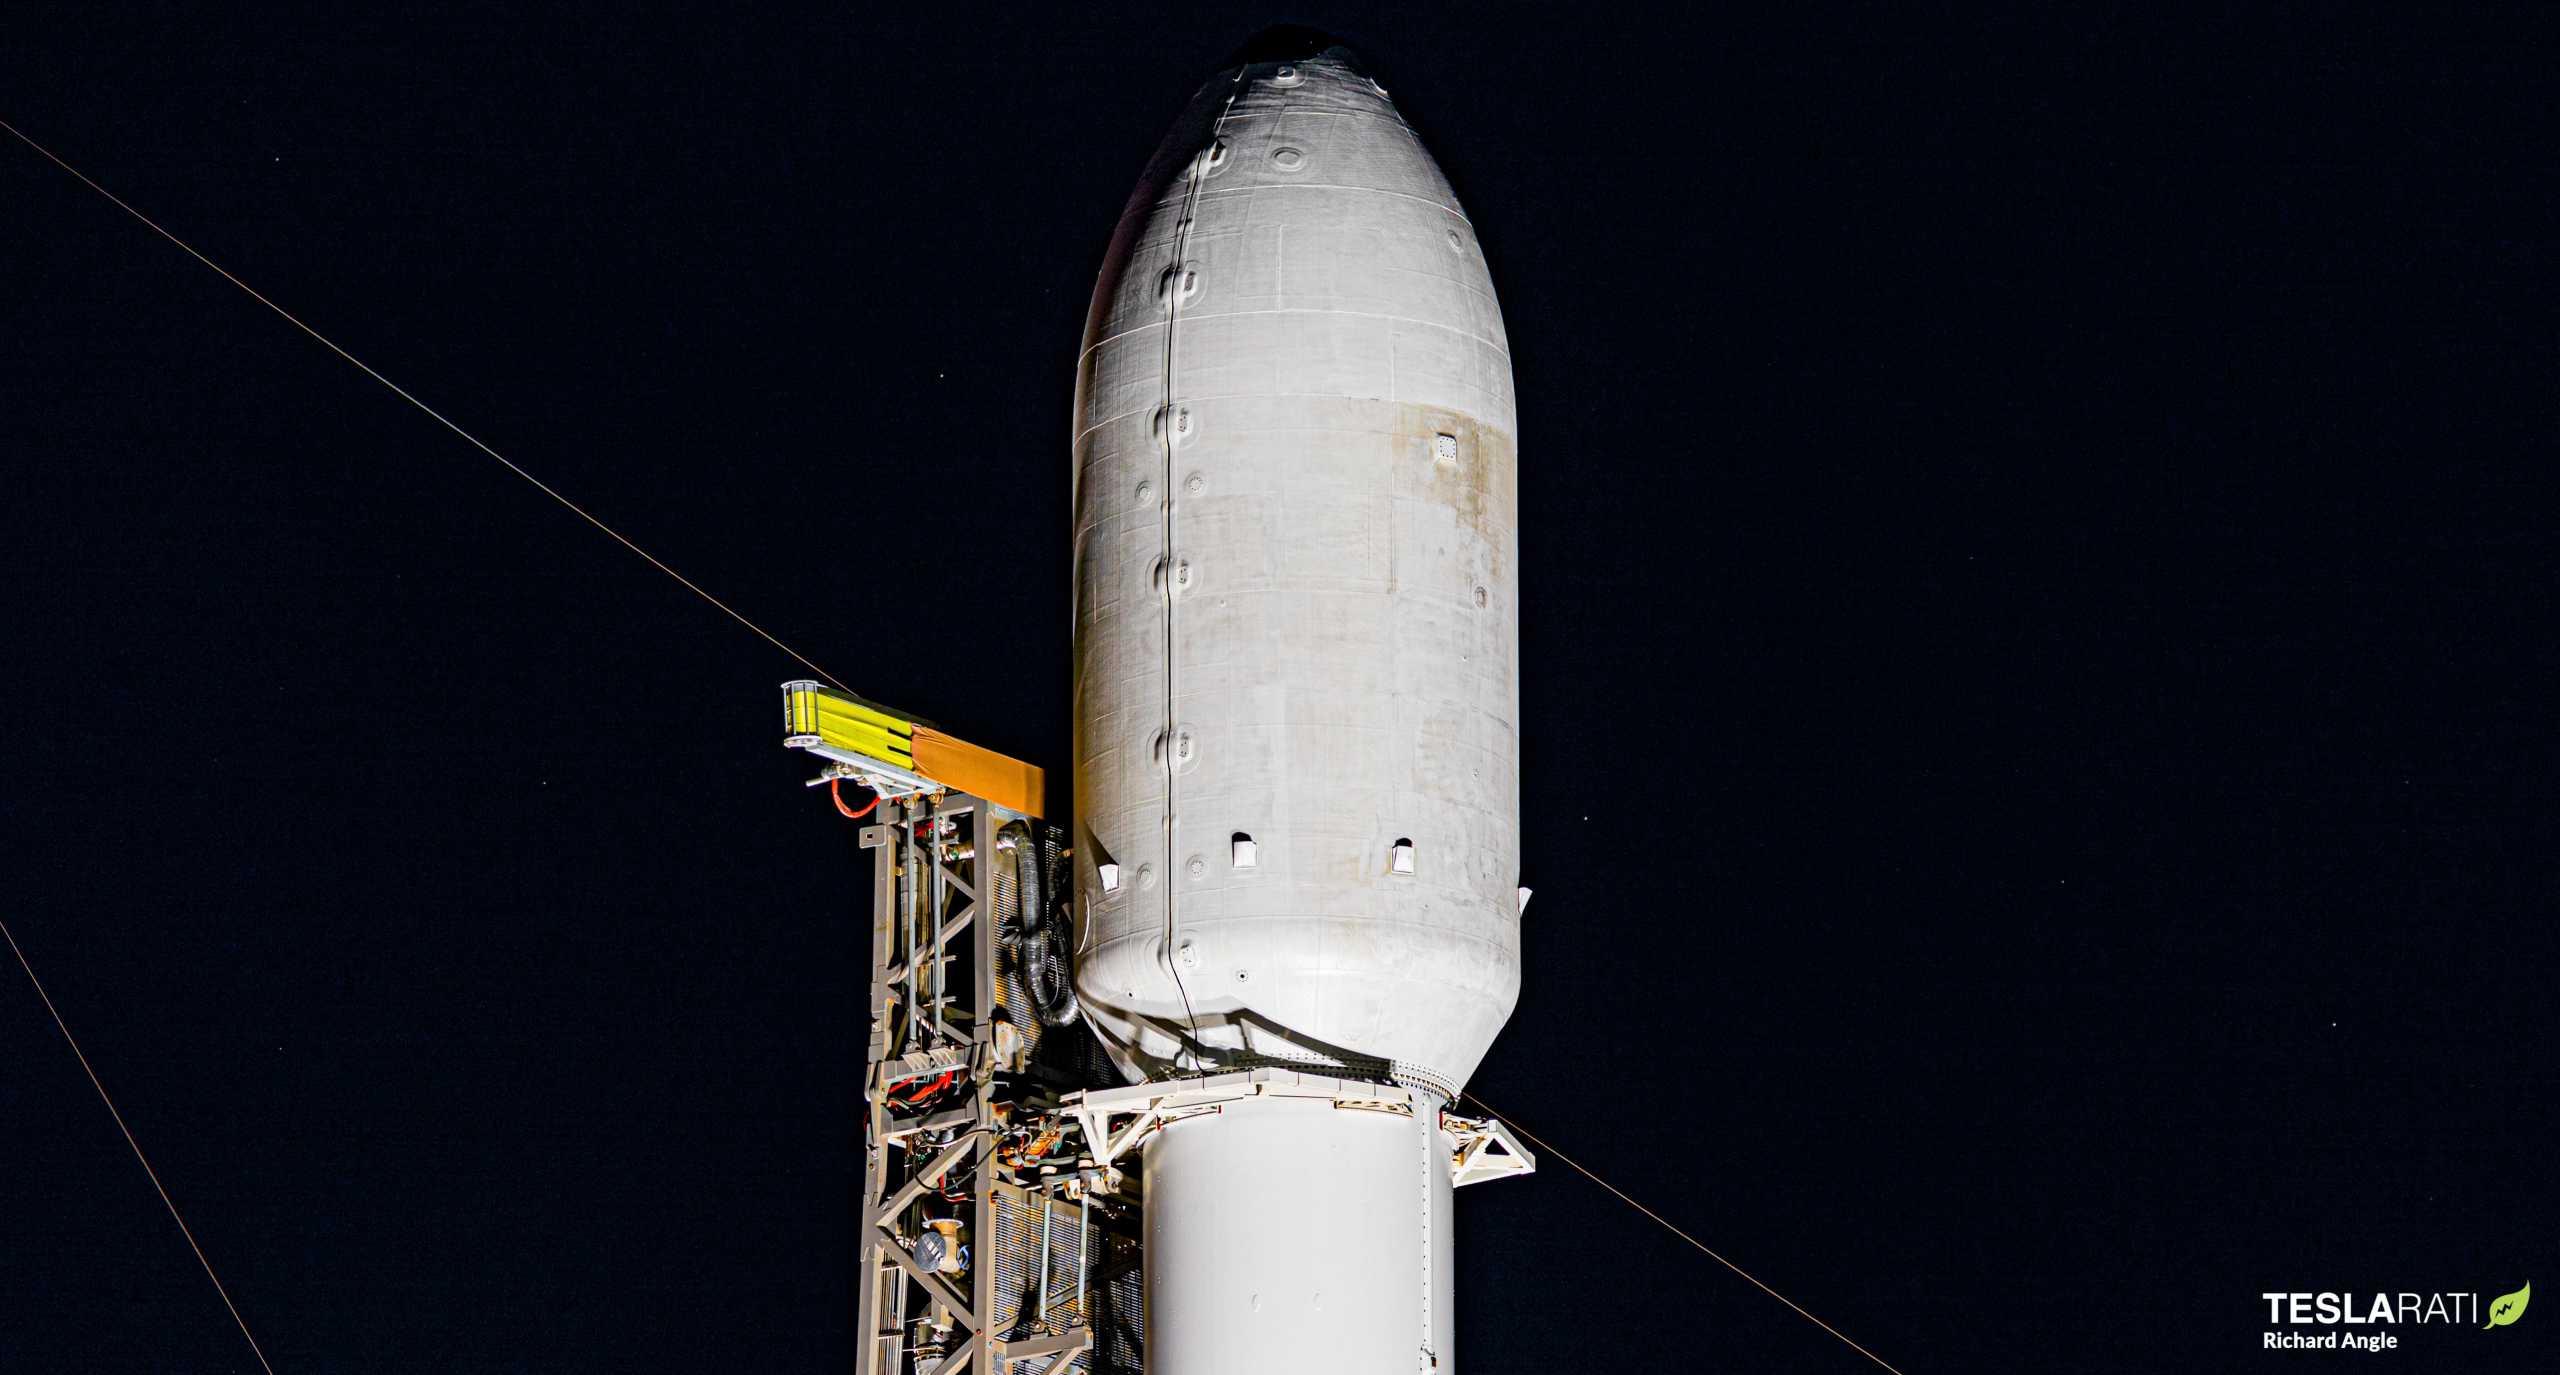 Starlink-10 SkySat Falcon 9 B1049 081820 (Richard Angle) prelaunch fairing 1 (c)